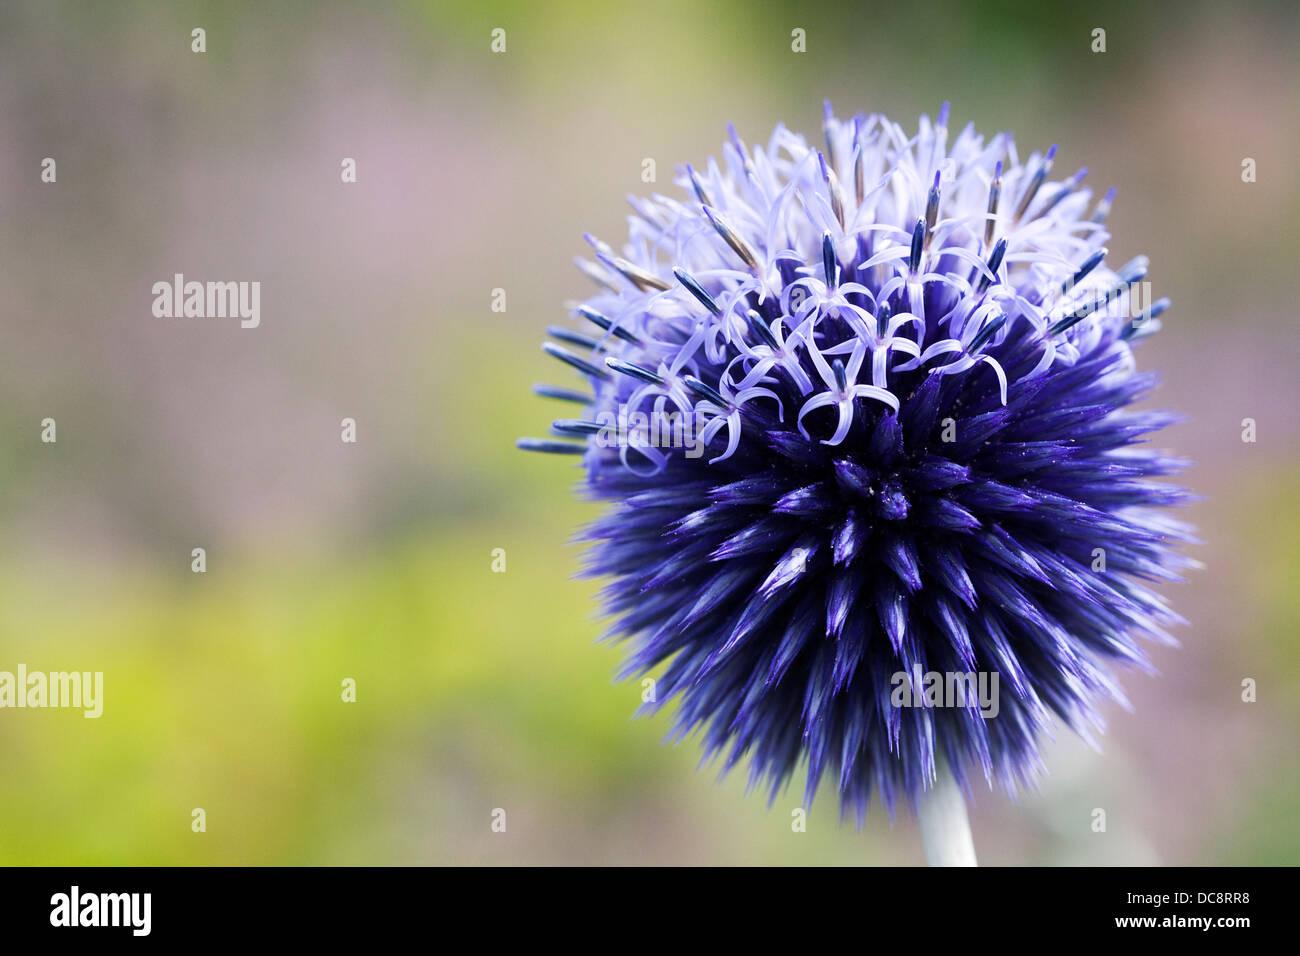 Echinops bannaticus Taplow 'Azul'. Cardo de Globe. Imagen De Stock